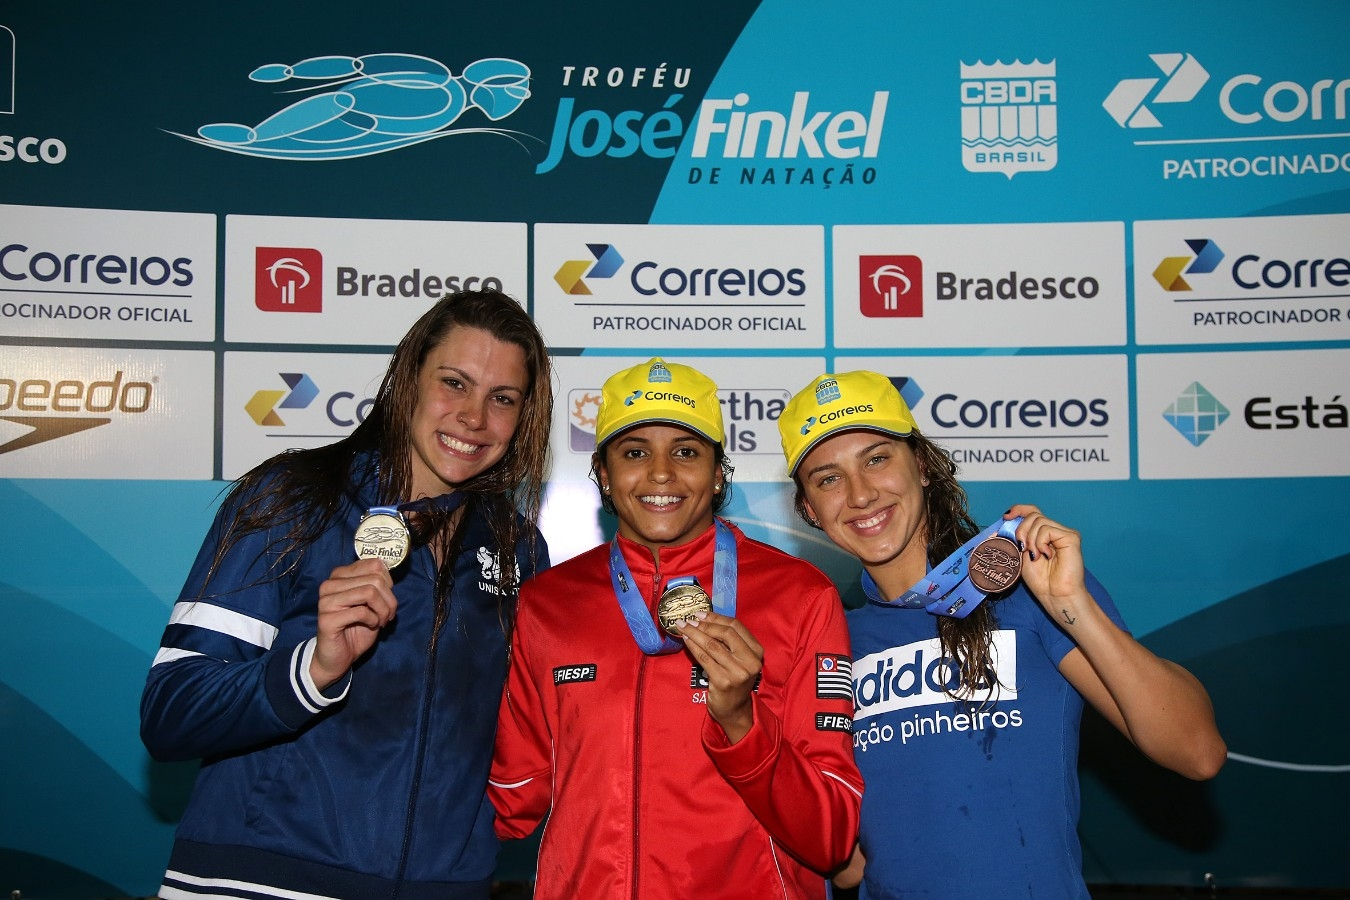 Etiene Medeiros - Trofeu Jose Finkel de Natacao no Clube Internacional de Regatas. 14 de Setembro de 2016, Santos, SP, Brasil. Foto:Satiro Sodré/SSPress.